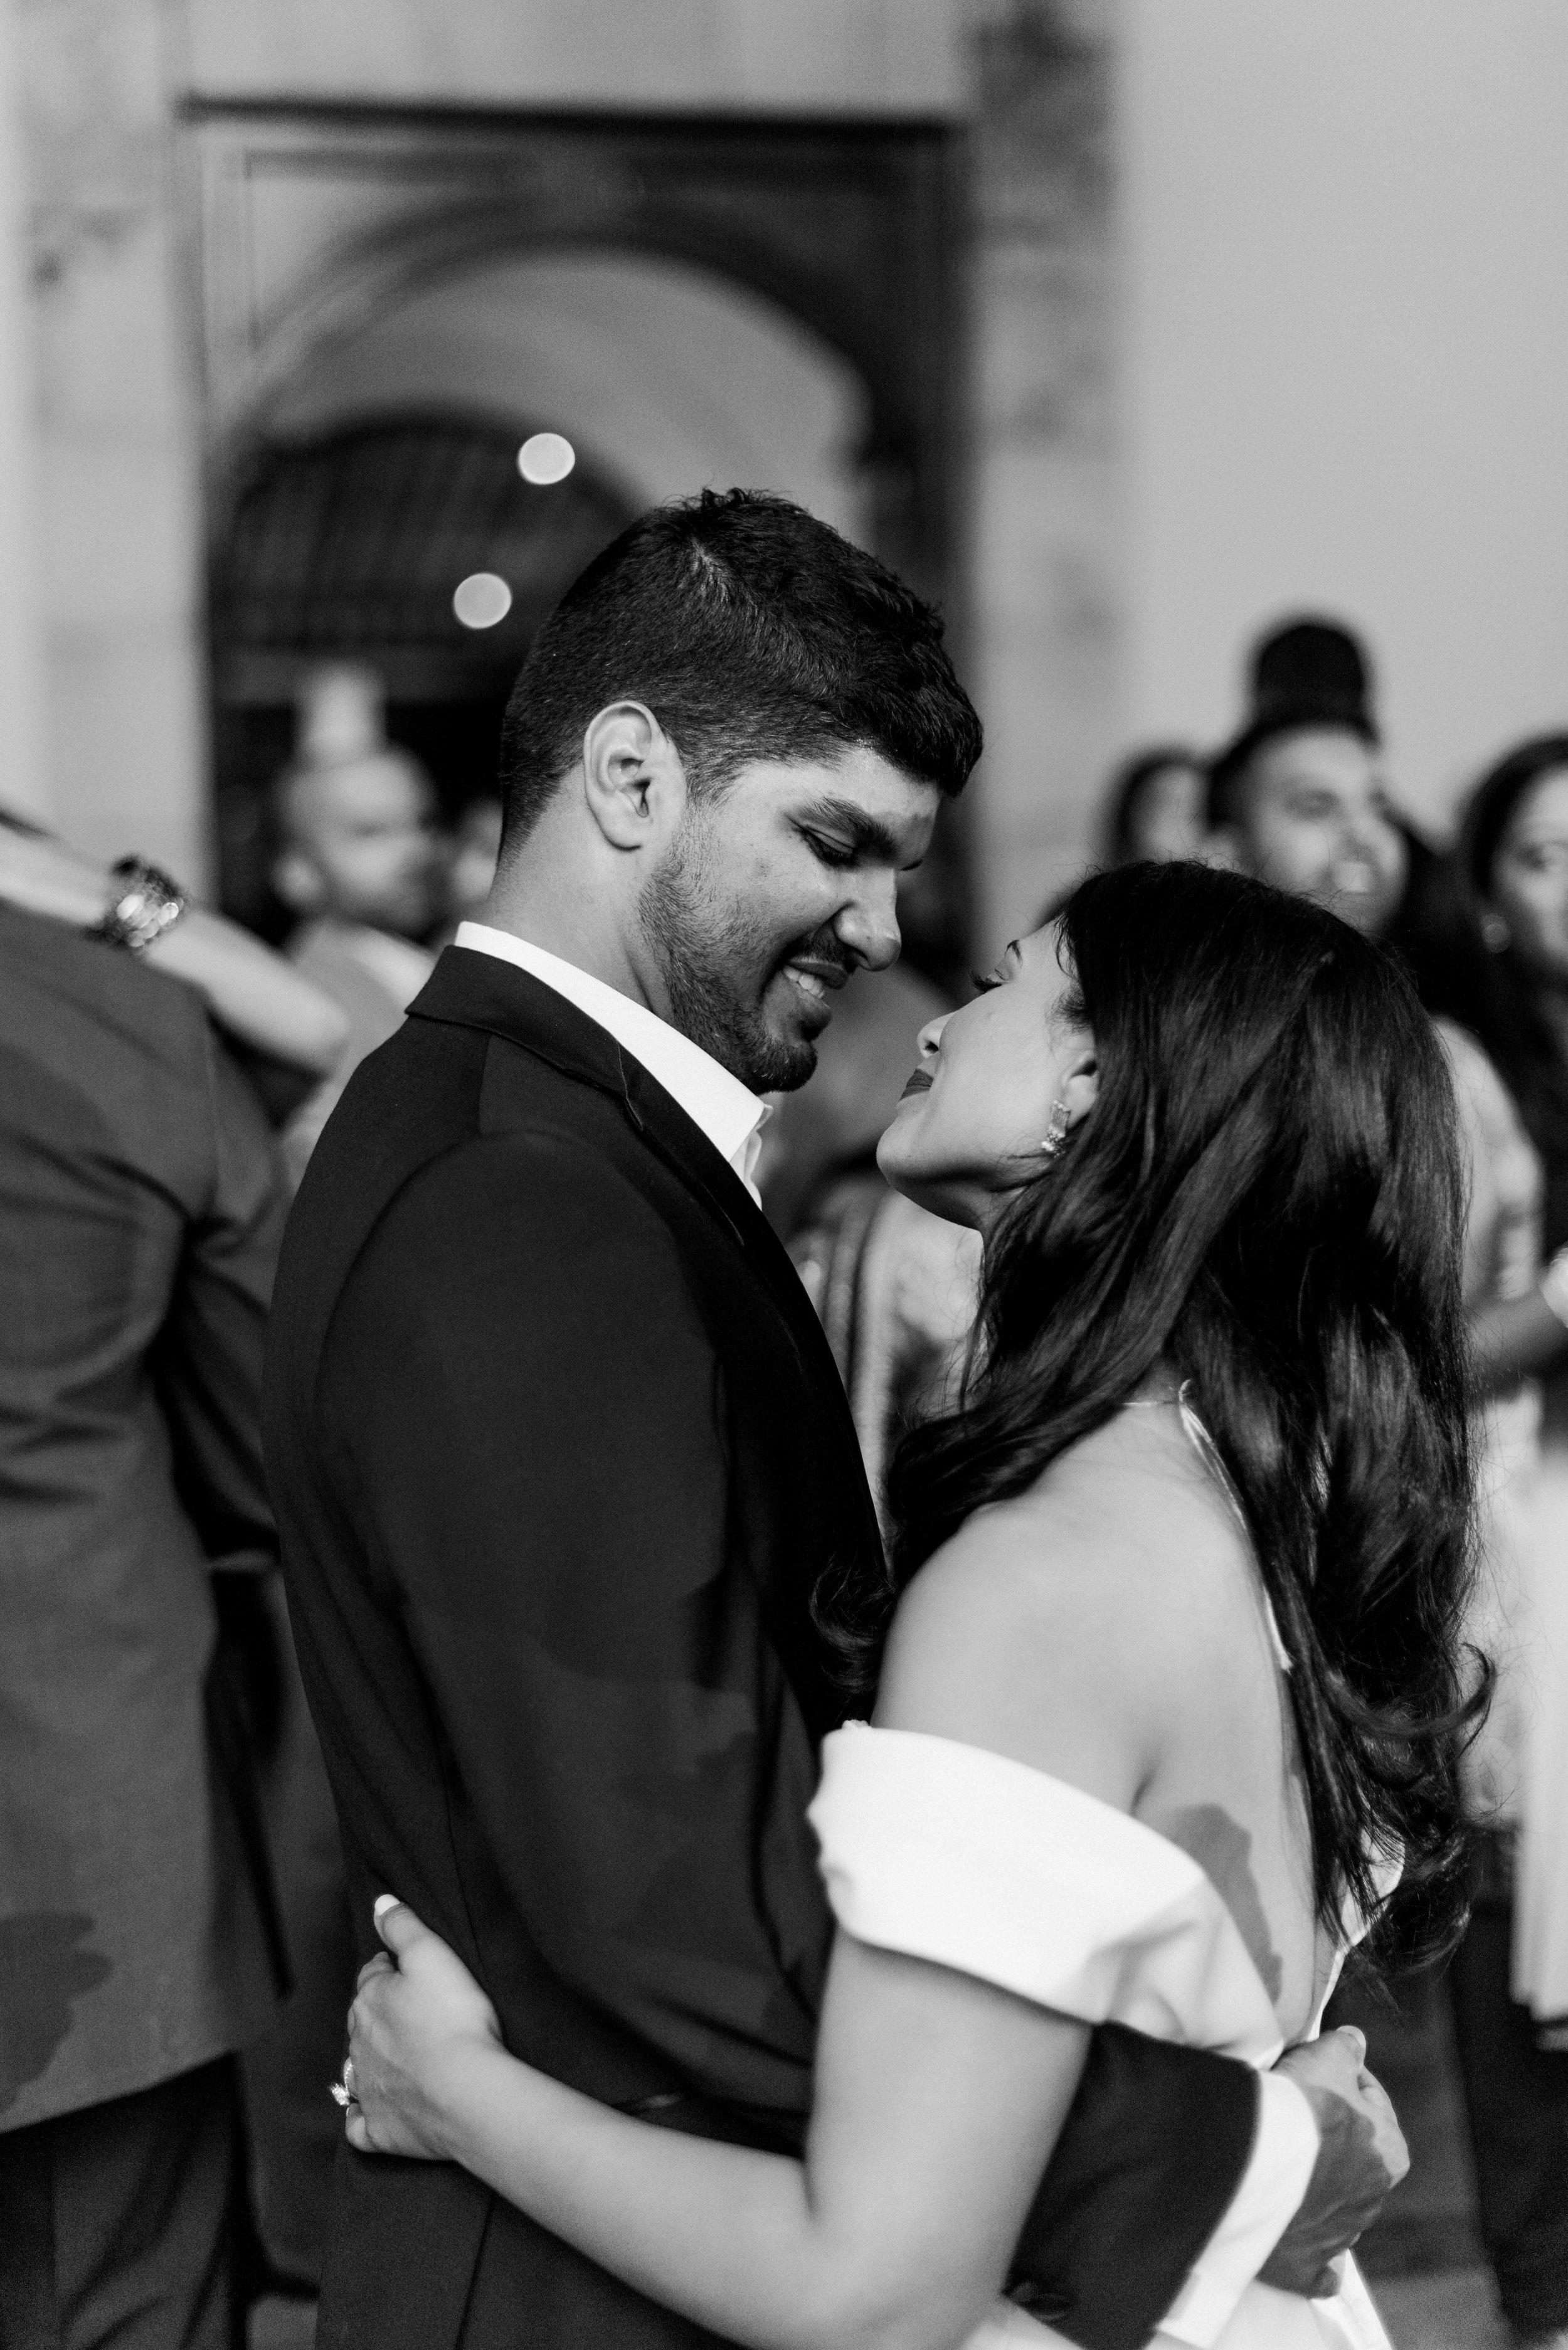 Fine-Art-Film-Houston-Wedding-Photographer-Best-Top-Luxury-Texas-Austin-Dallas-Destination-Dana-Fernandez-Photography-The-Bell-Tower-on-34th-Indian-35-2.jpg